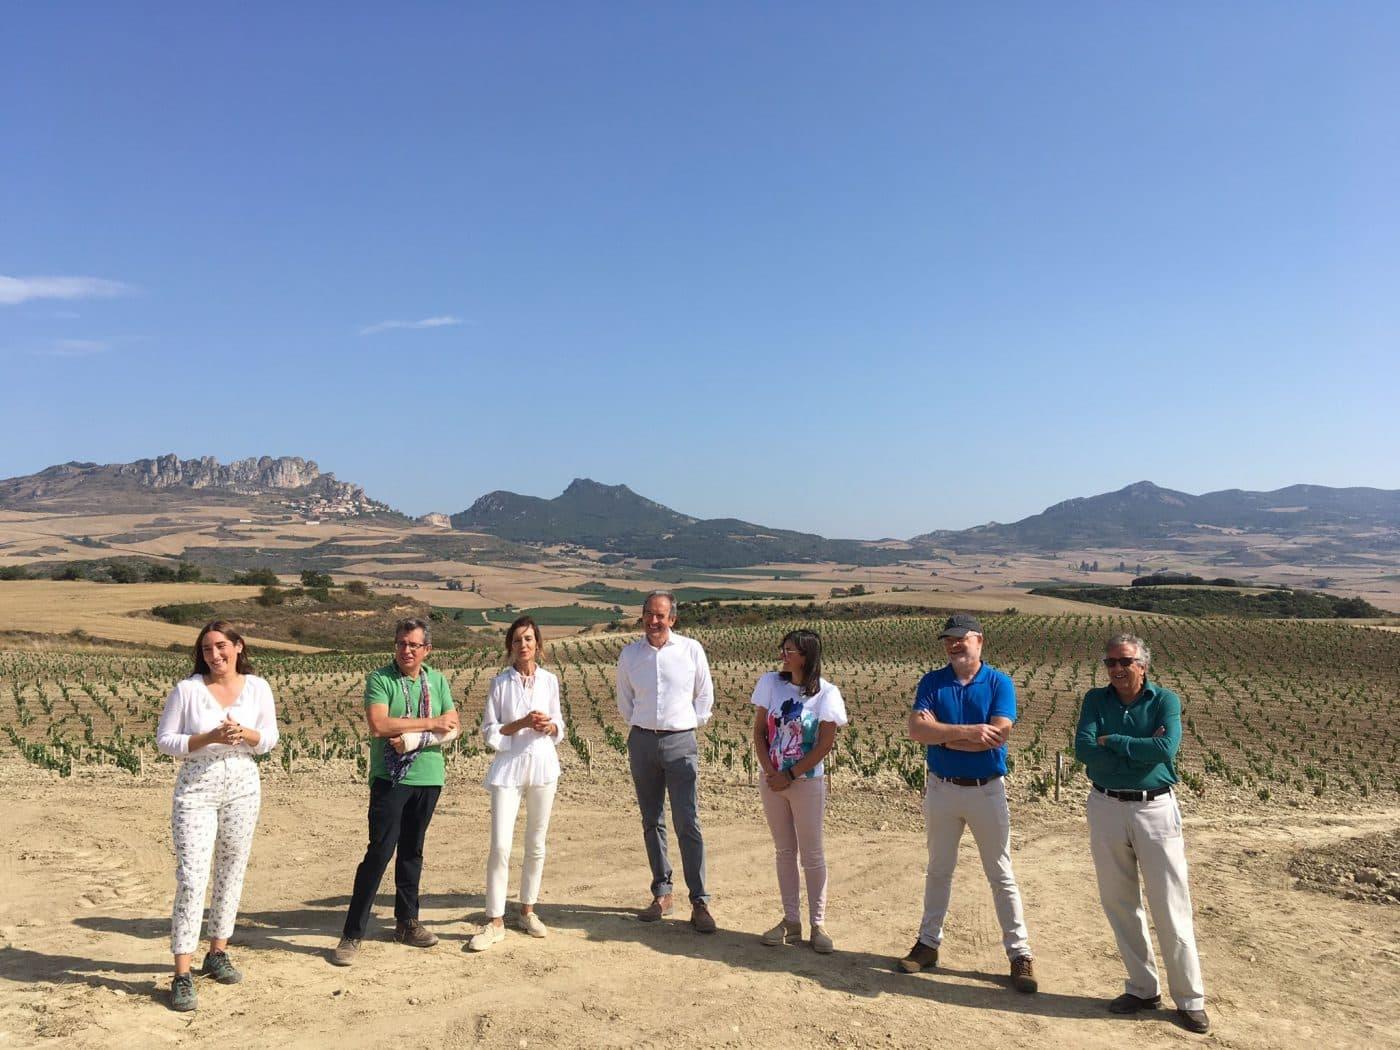 Bodegas Roda apuesta en Cellorigo por la viticultura regenerativa a través de un rompedor proyecto 1